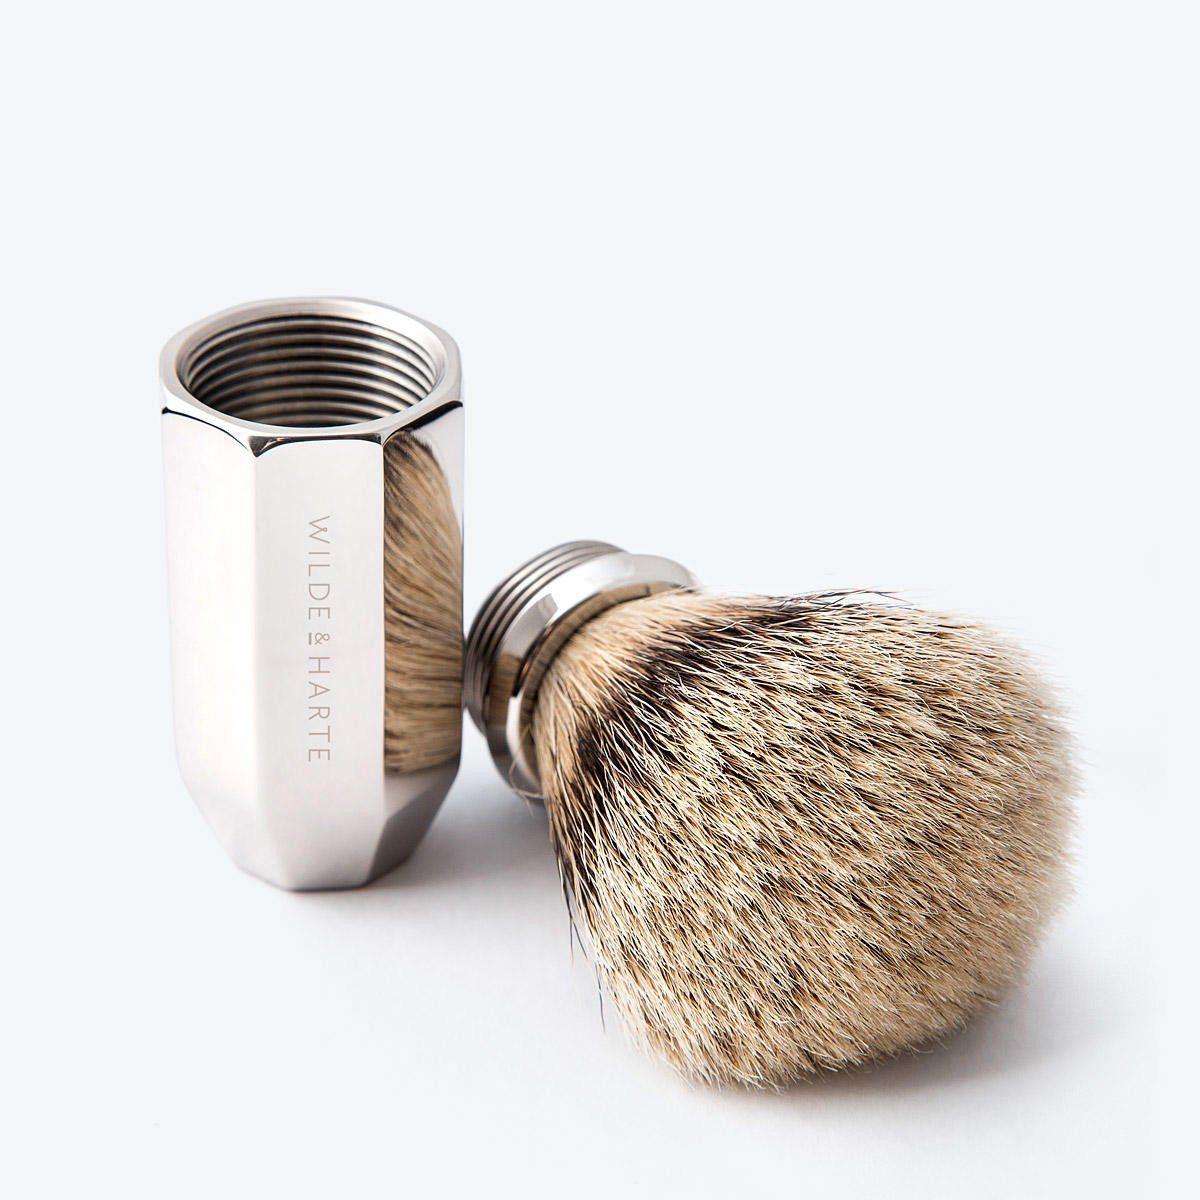 Wilde & Harte Traditional Design Safety Razor & Shaving